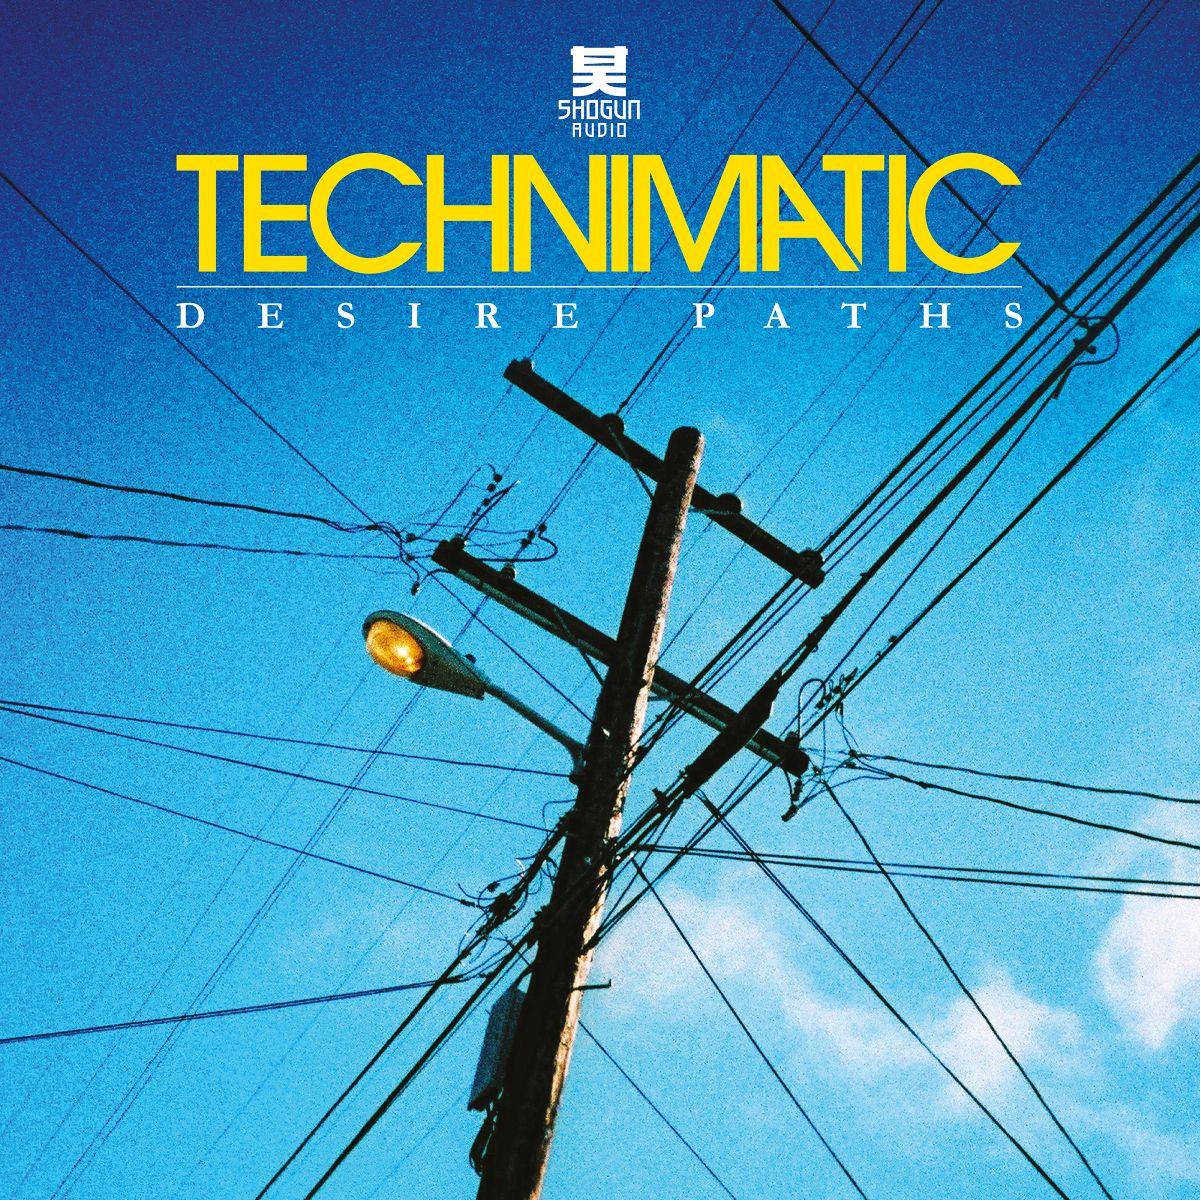 Technimatic/DESIRE PATHS DLP + CD